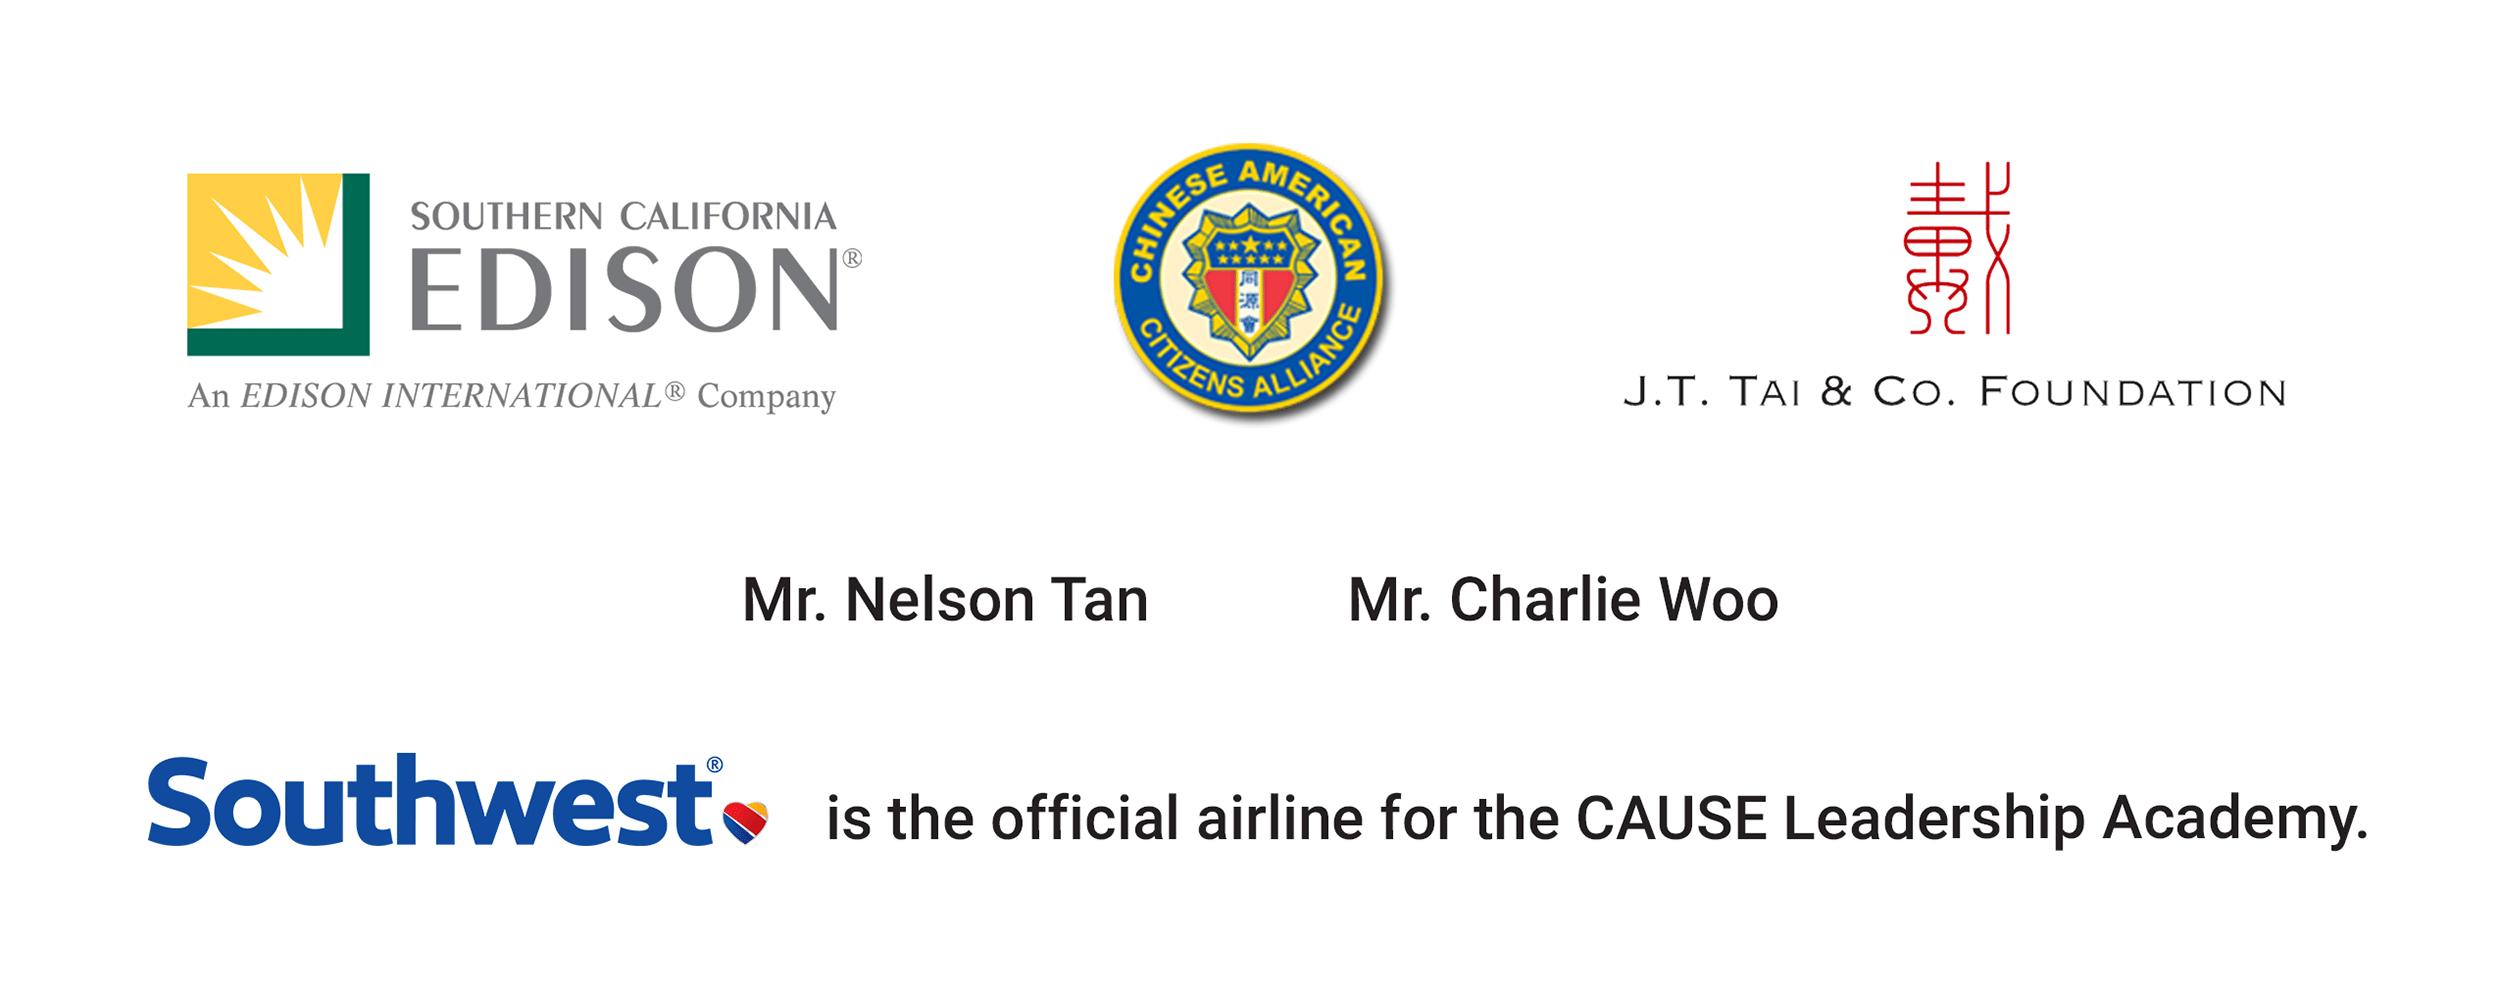 2017 CAUSE Leadership Academy sponsors